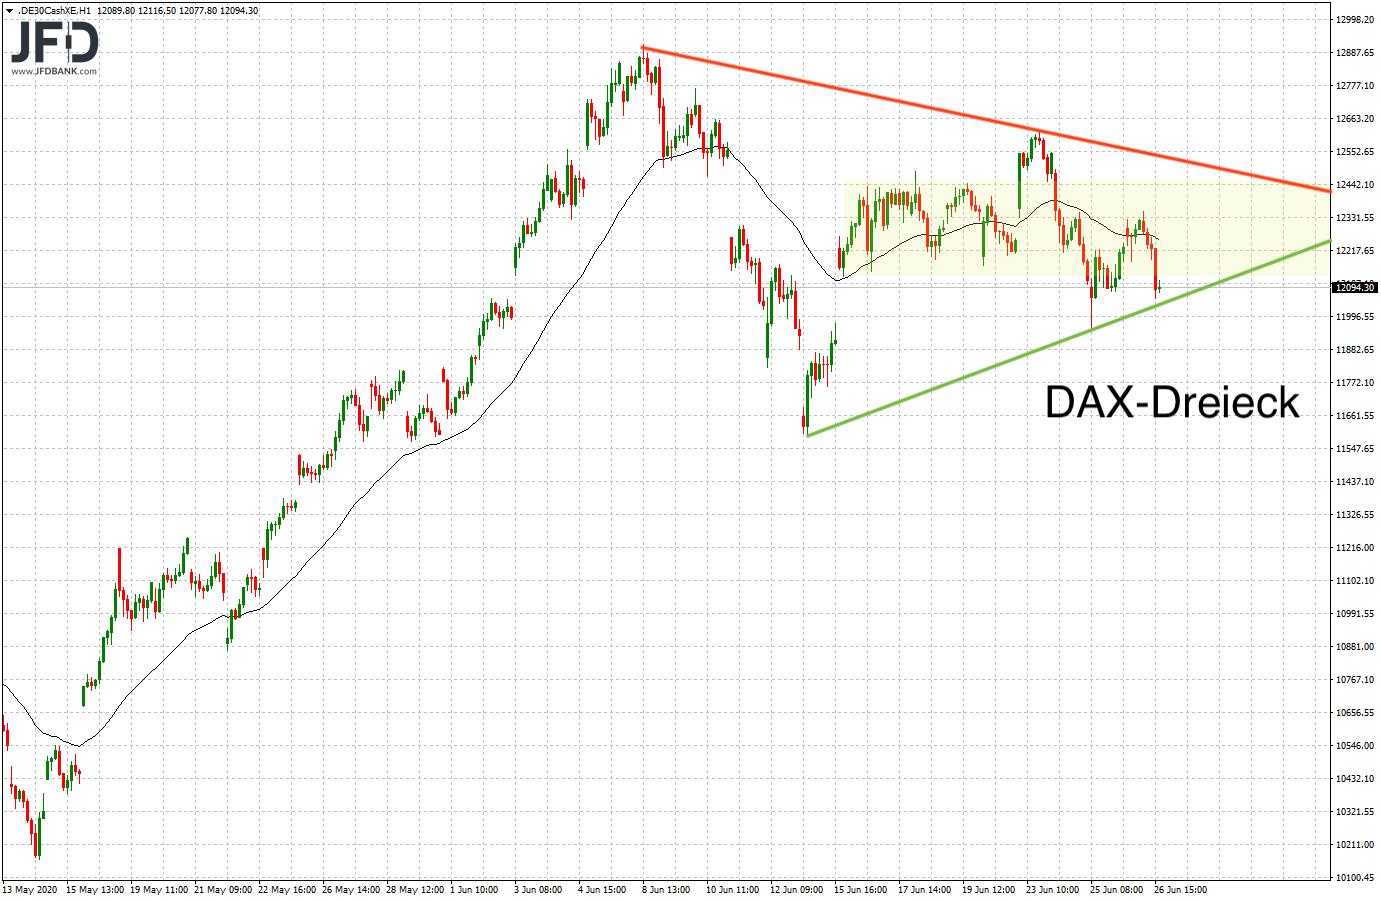 Rückblick auf das DAX-Dreieck